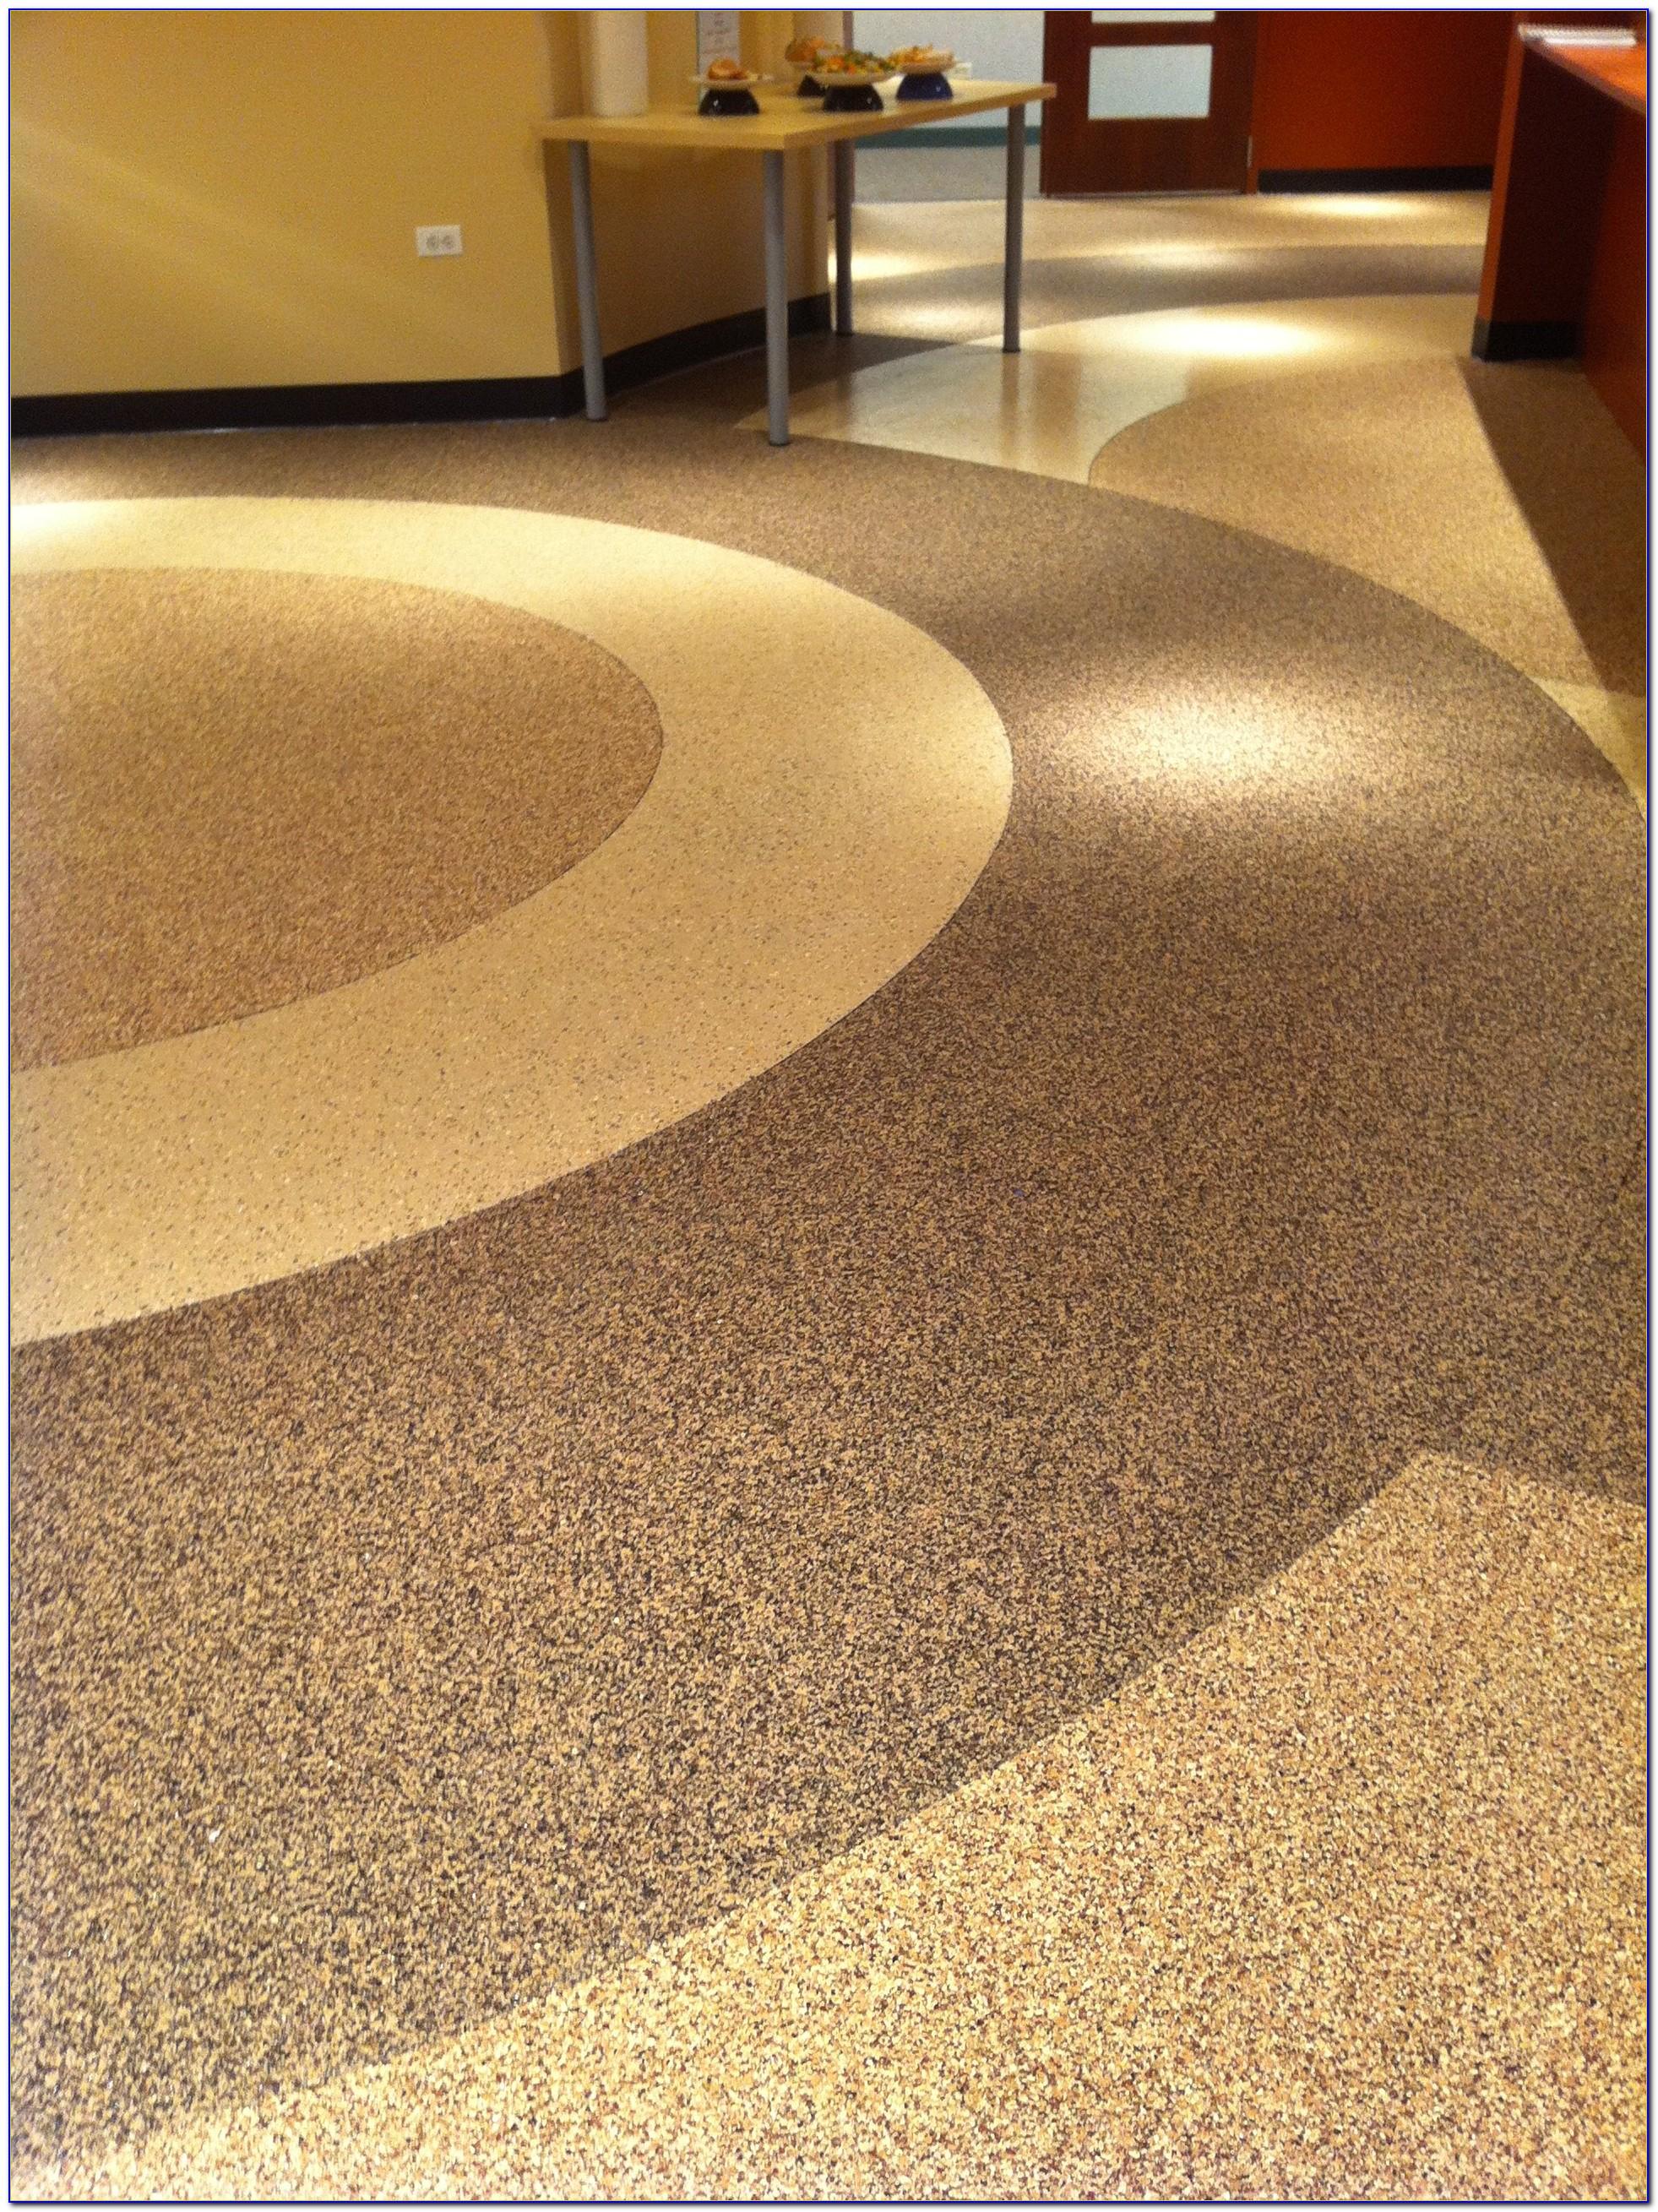 Rust Oleum Epoxy Shield Professional Garage Floor Coating